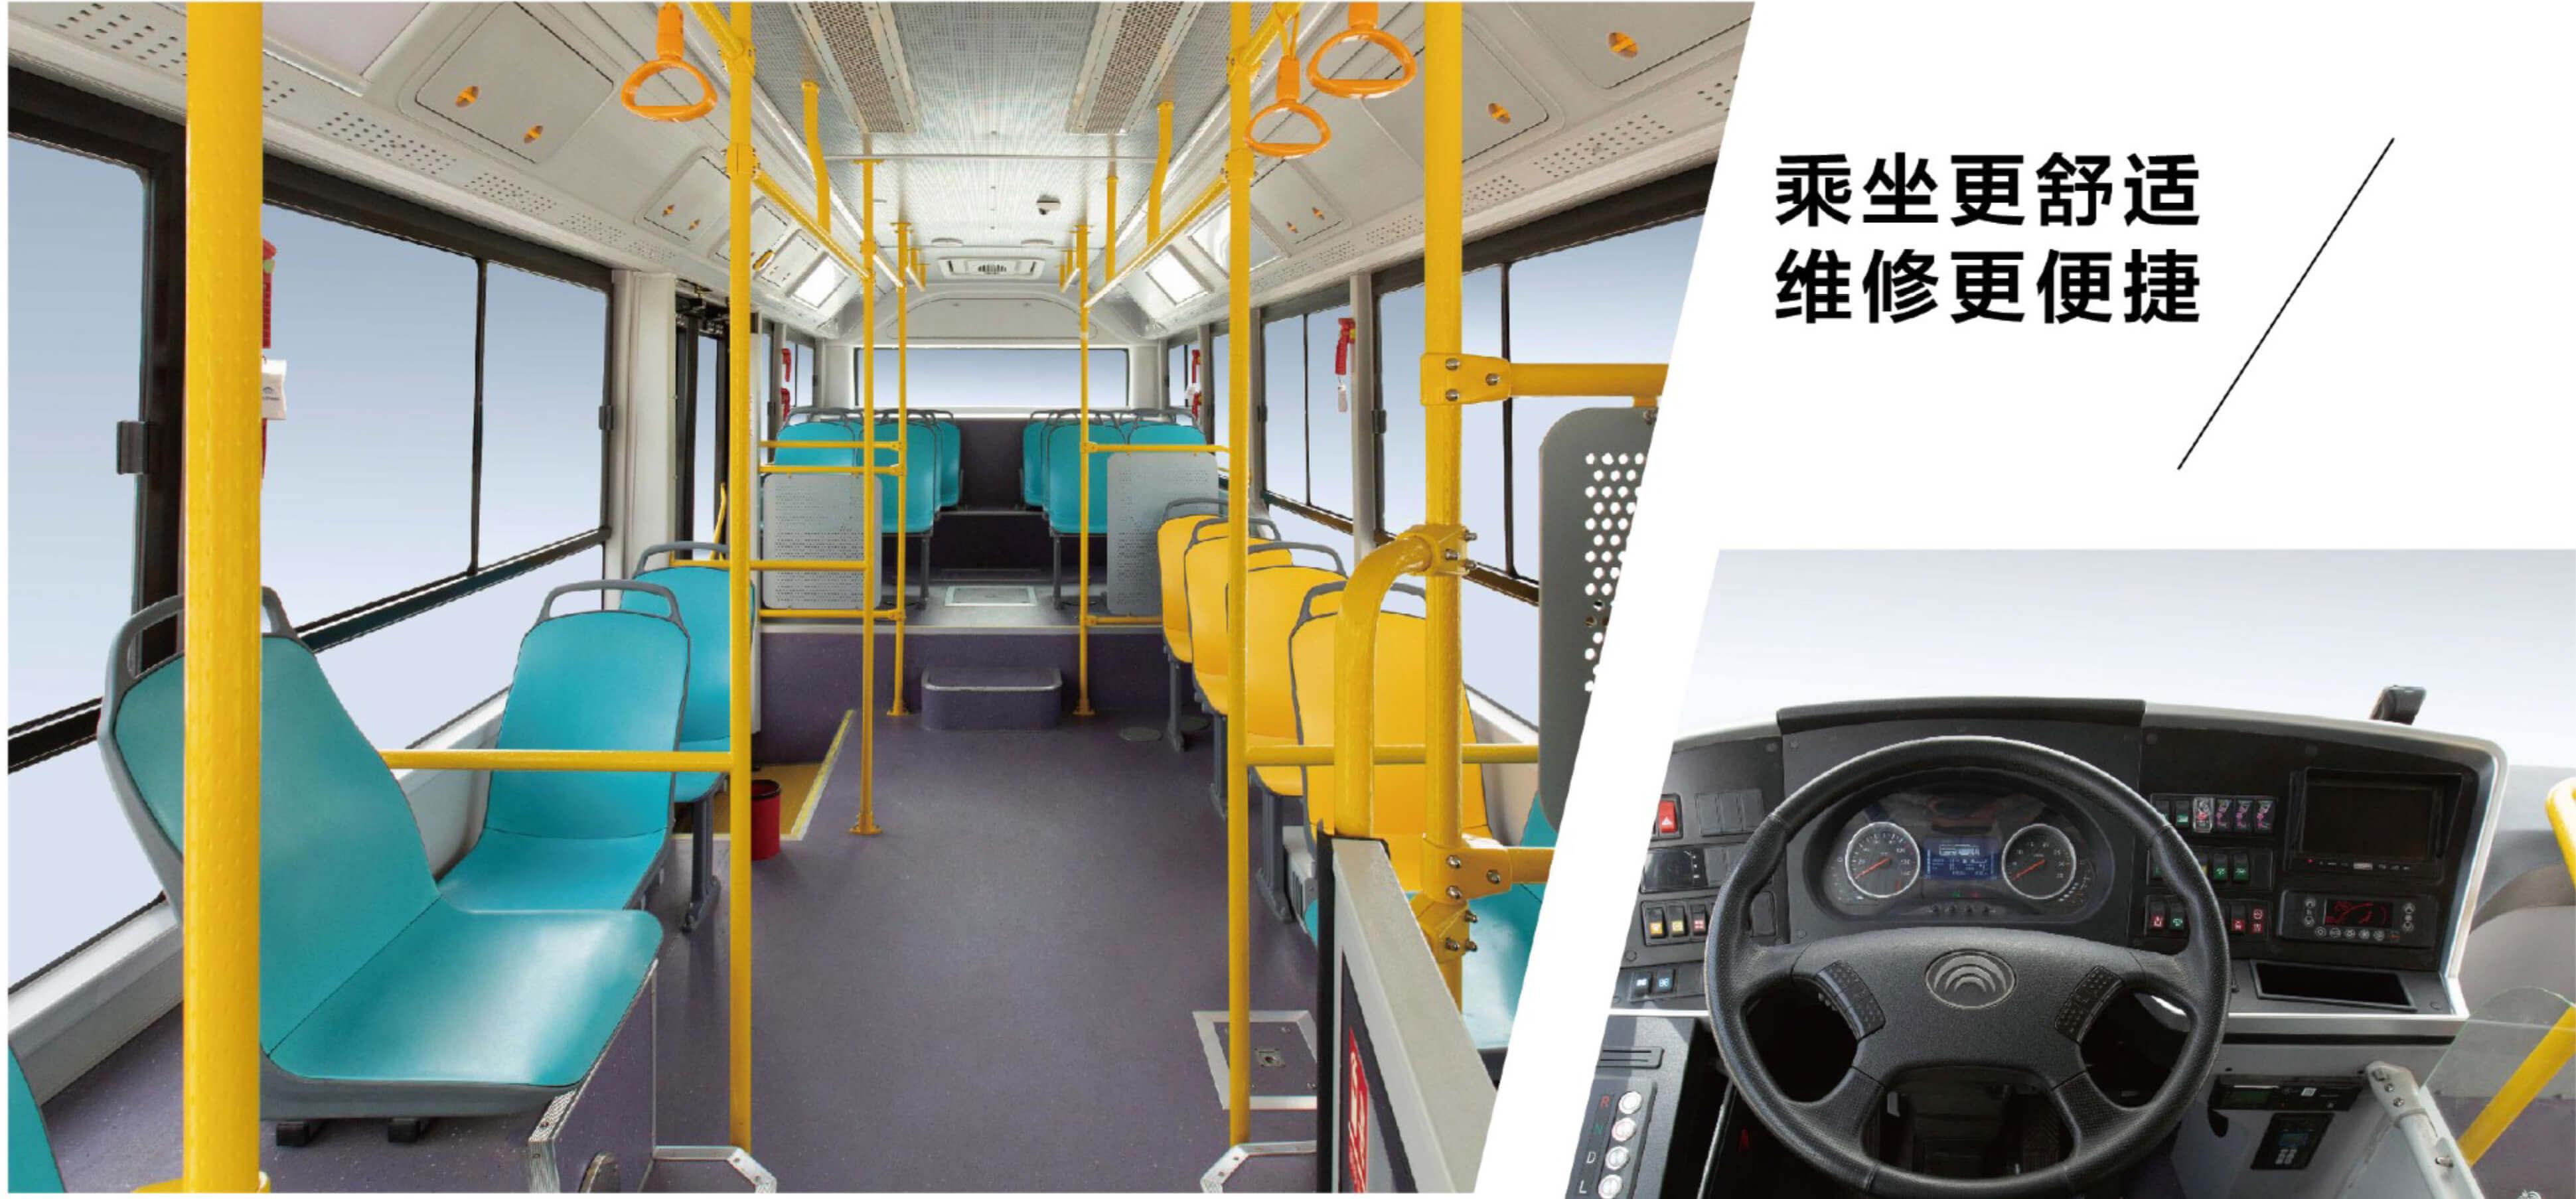 E8PLUS (公交皇冠体育:)